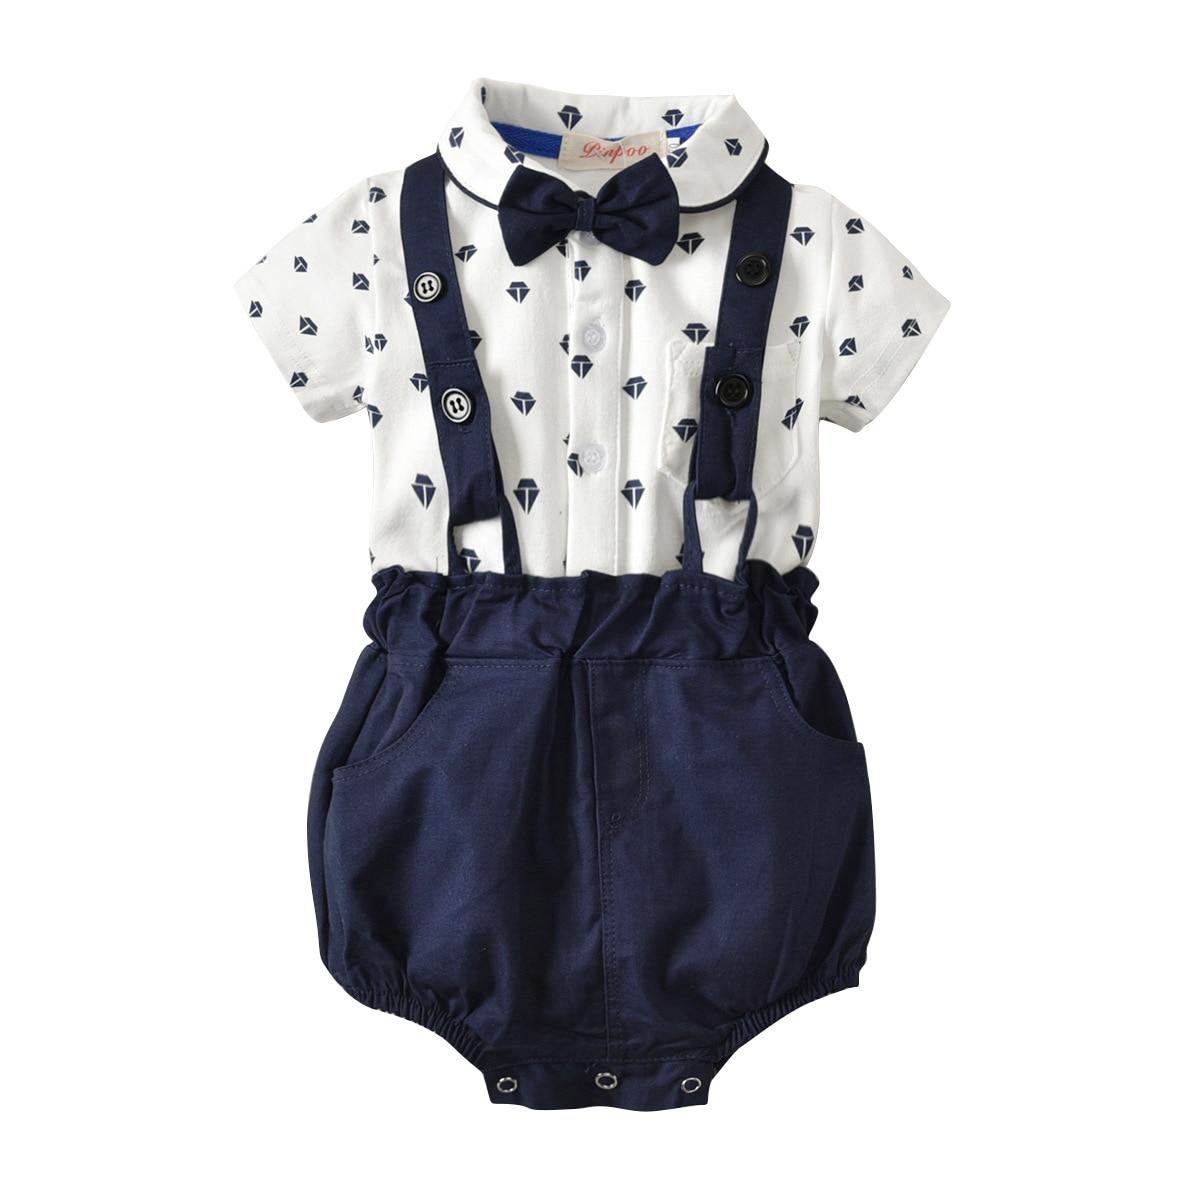 Summer style baby boy clothing set newborn infant clothing 2pcs short sleeve t-shirt + suspenders gentleman suit Toddler Clothes